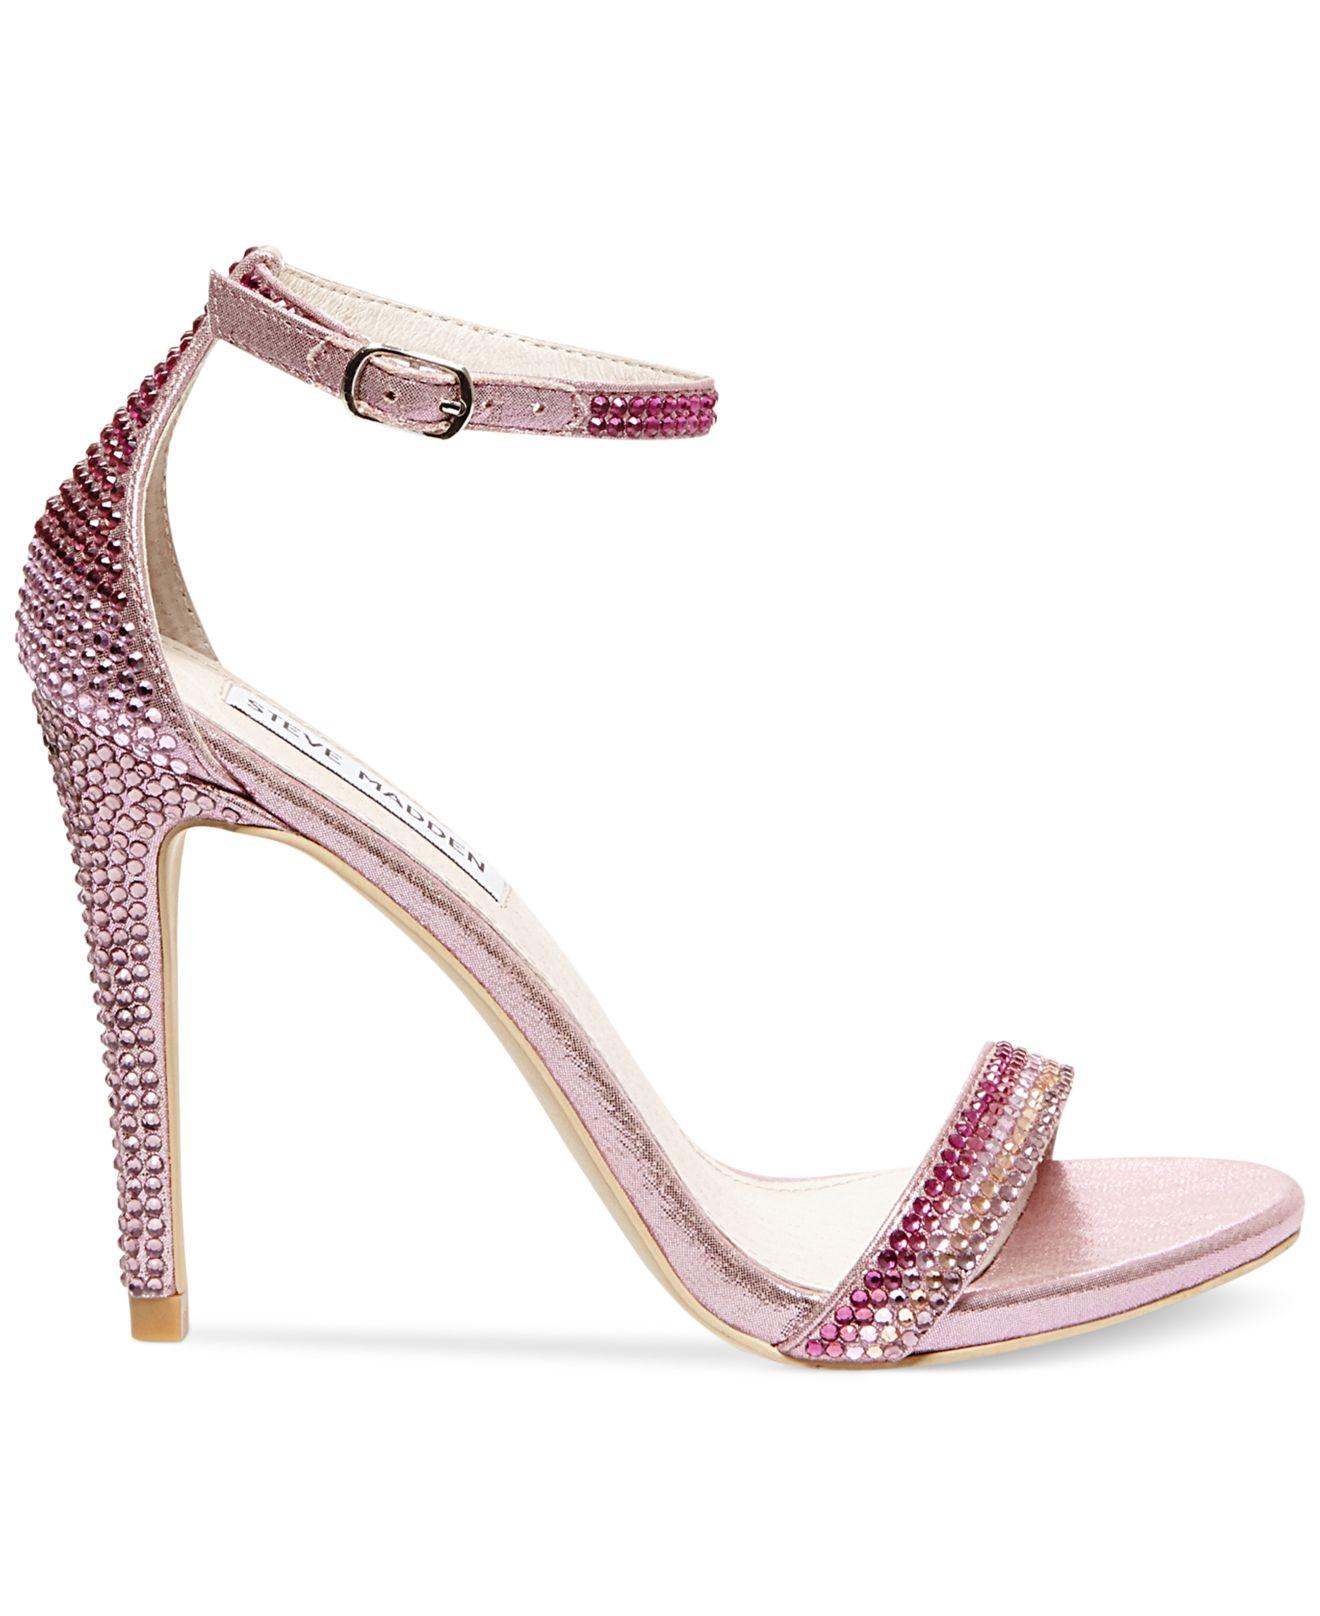 8d3eceab1 Steve Madden Women's Stecy Rhinestone Two-piece Sandals in Pink - Lyst